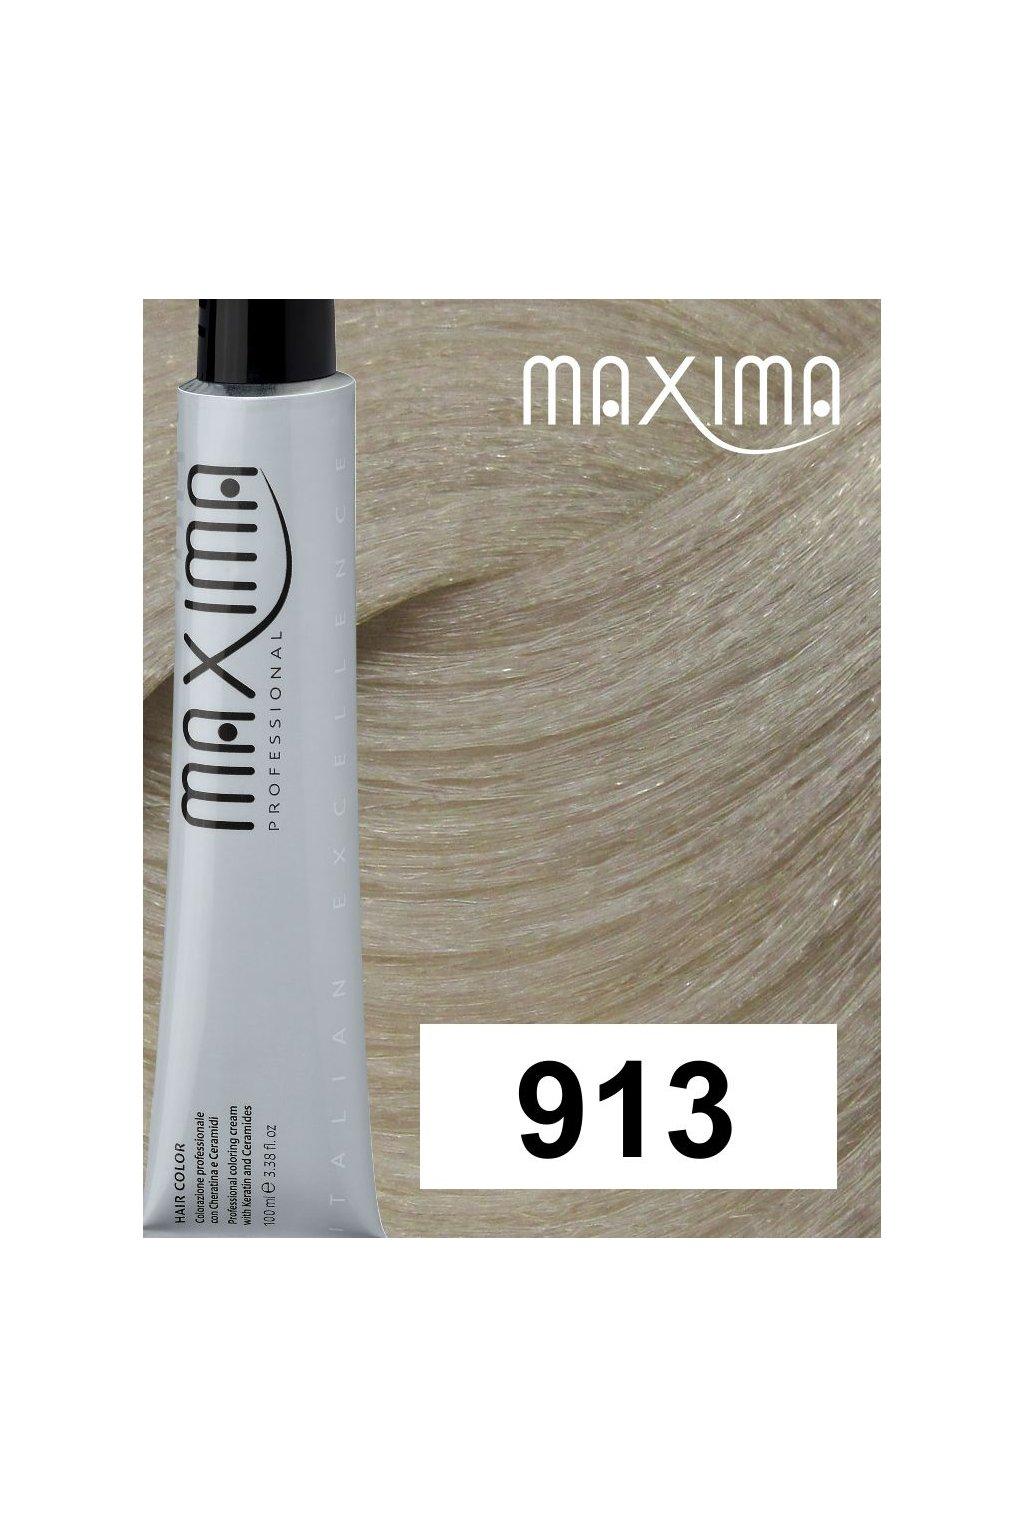 913 max